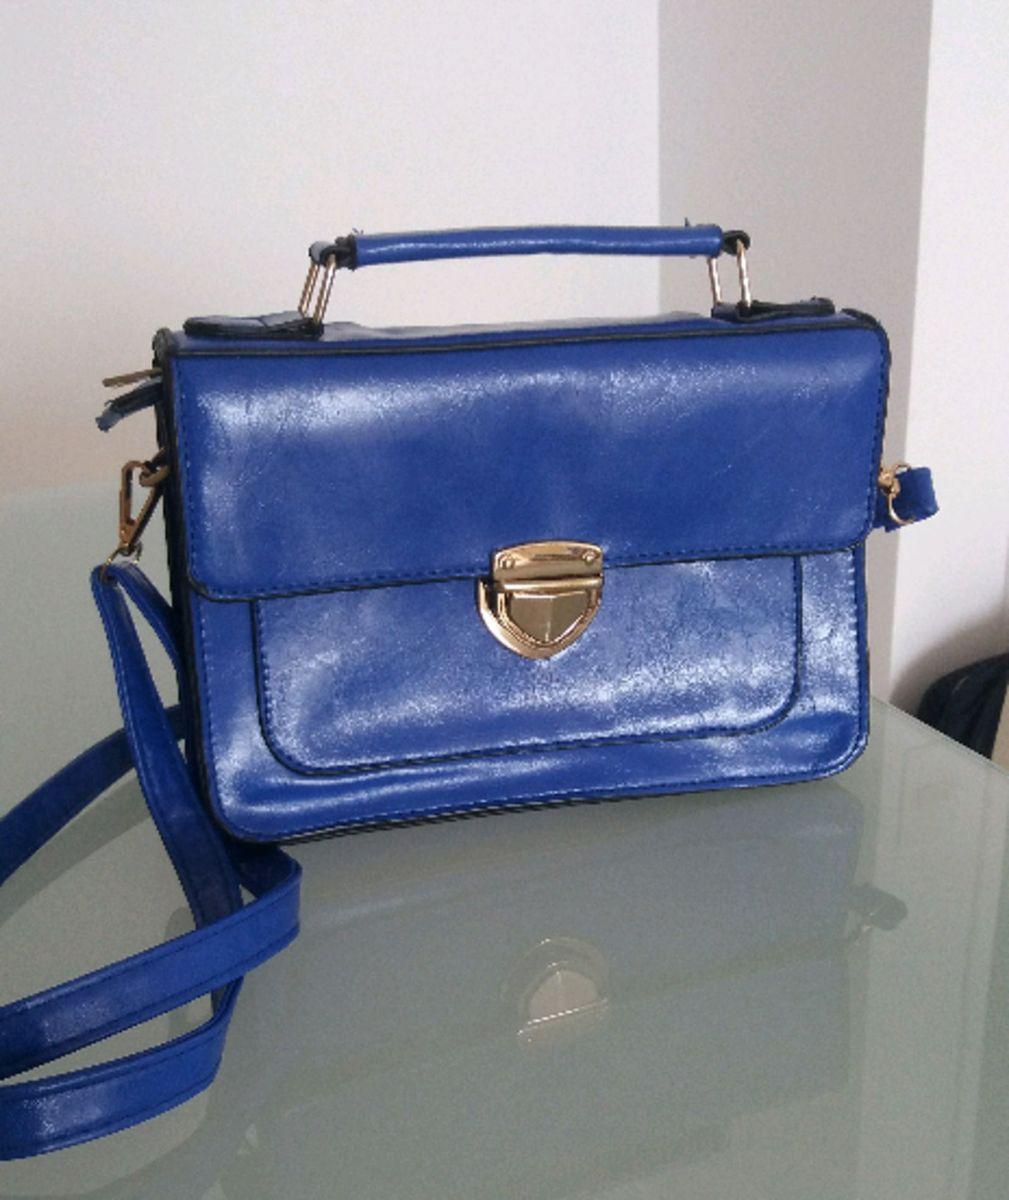 b28791e346e bolsa carteiro azul royal - ombro sem marca.  Czm6ly9wag90b3muzw5qb2vplmnvbs5ici9wcm9kdwn0cy81mtm0mdqxlzy0ywmwm2m4mdzknjbkm2nkzdrjmmnkzduymdhhzwnhlmpwzw  ...